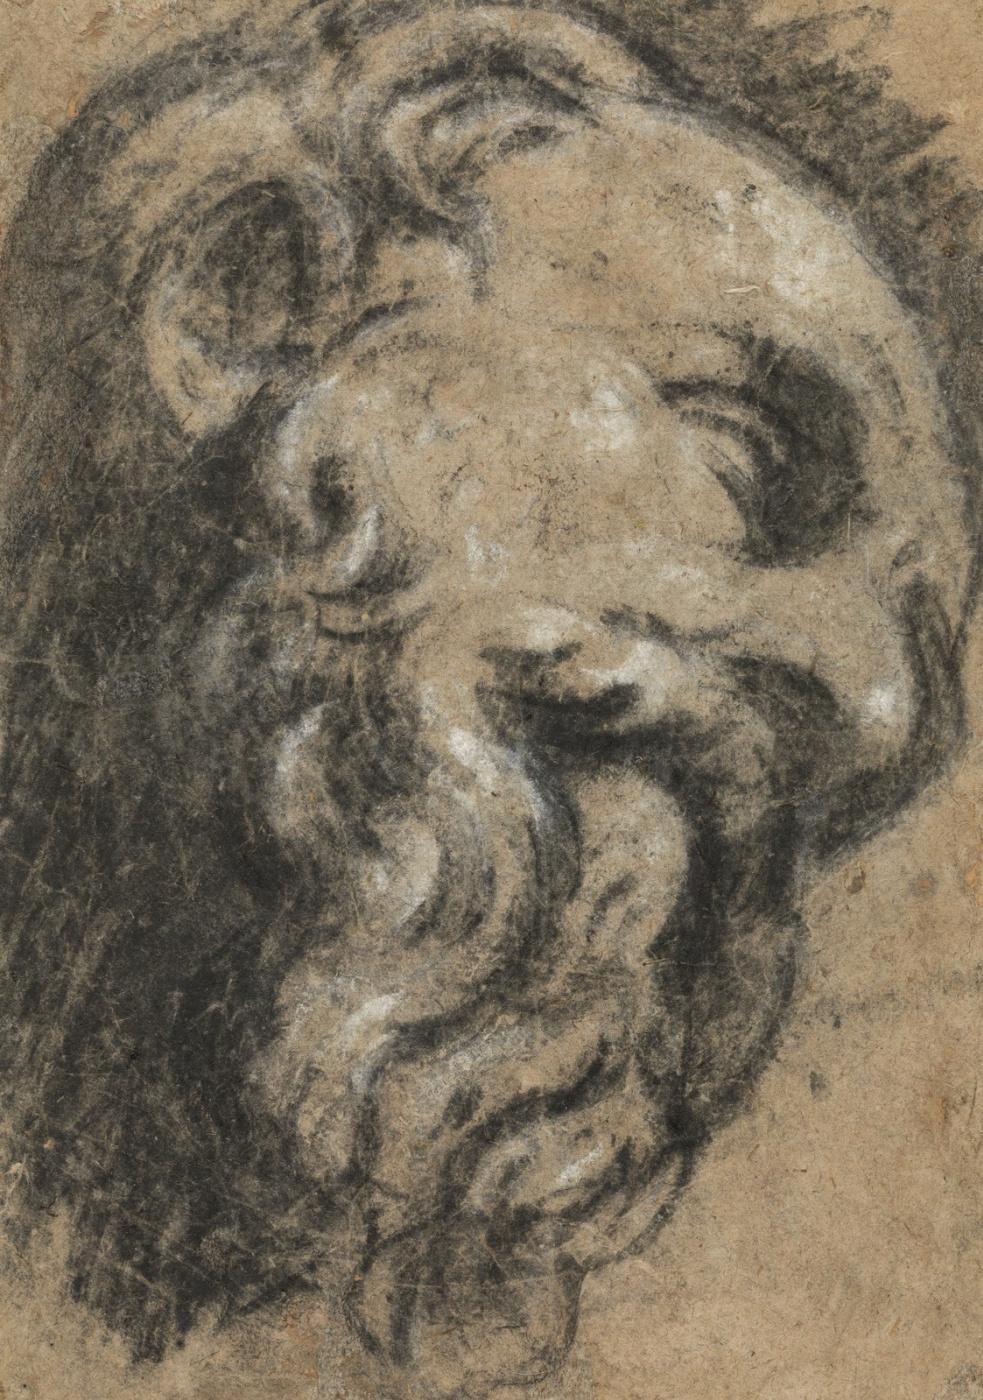 Jacopo (Robusti) Tintoretto. Study after Michelangelo. Saint Damian